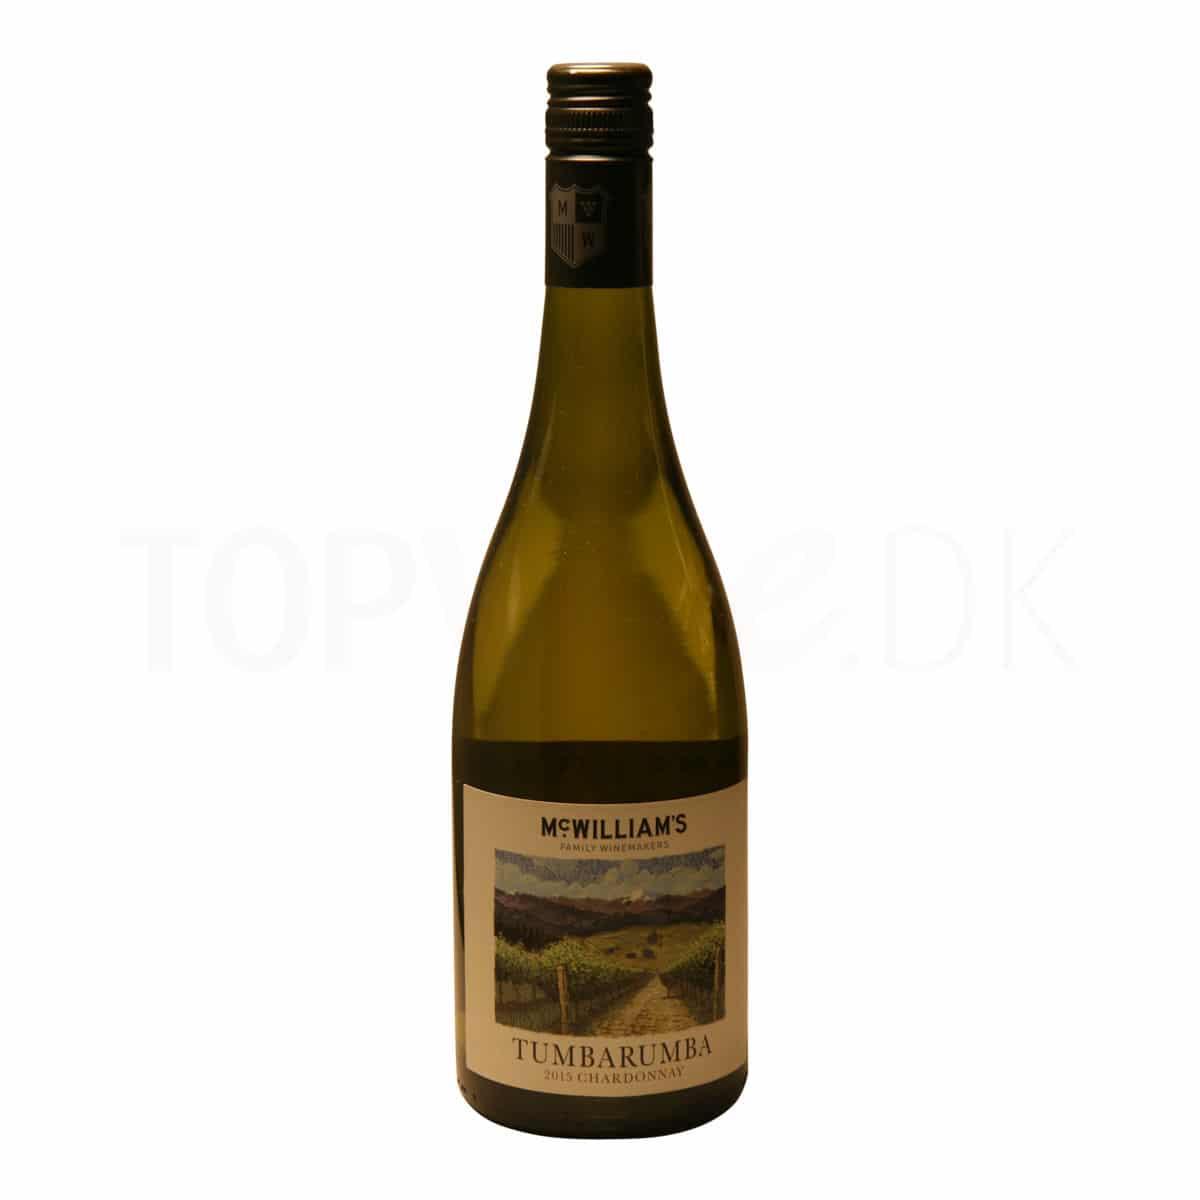 Topvine McWilliams Tumbarumba Chardonnay